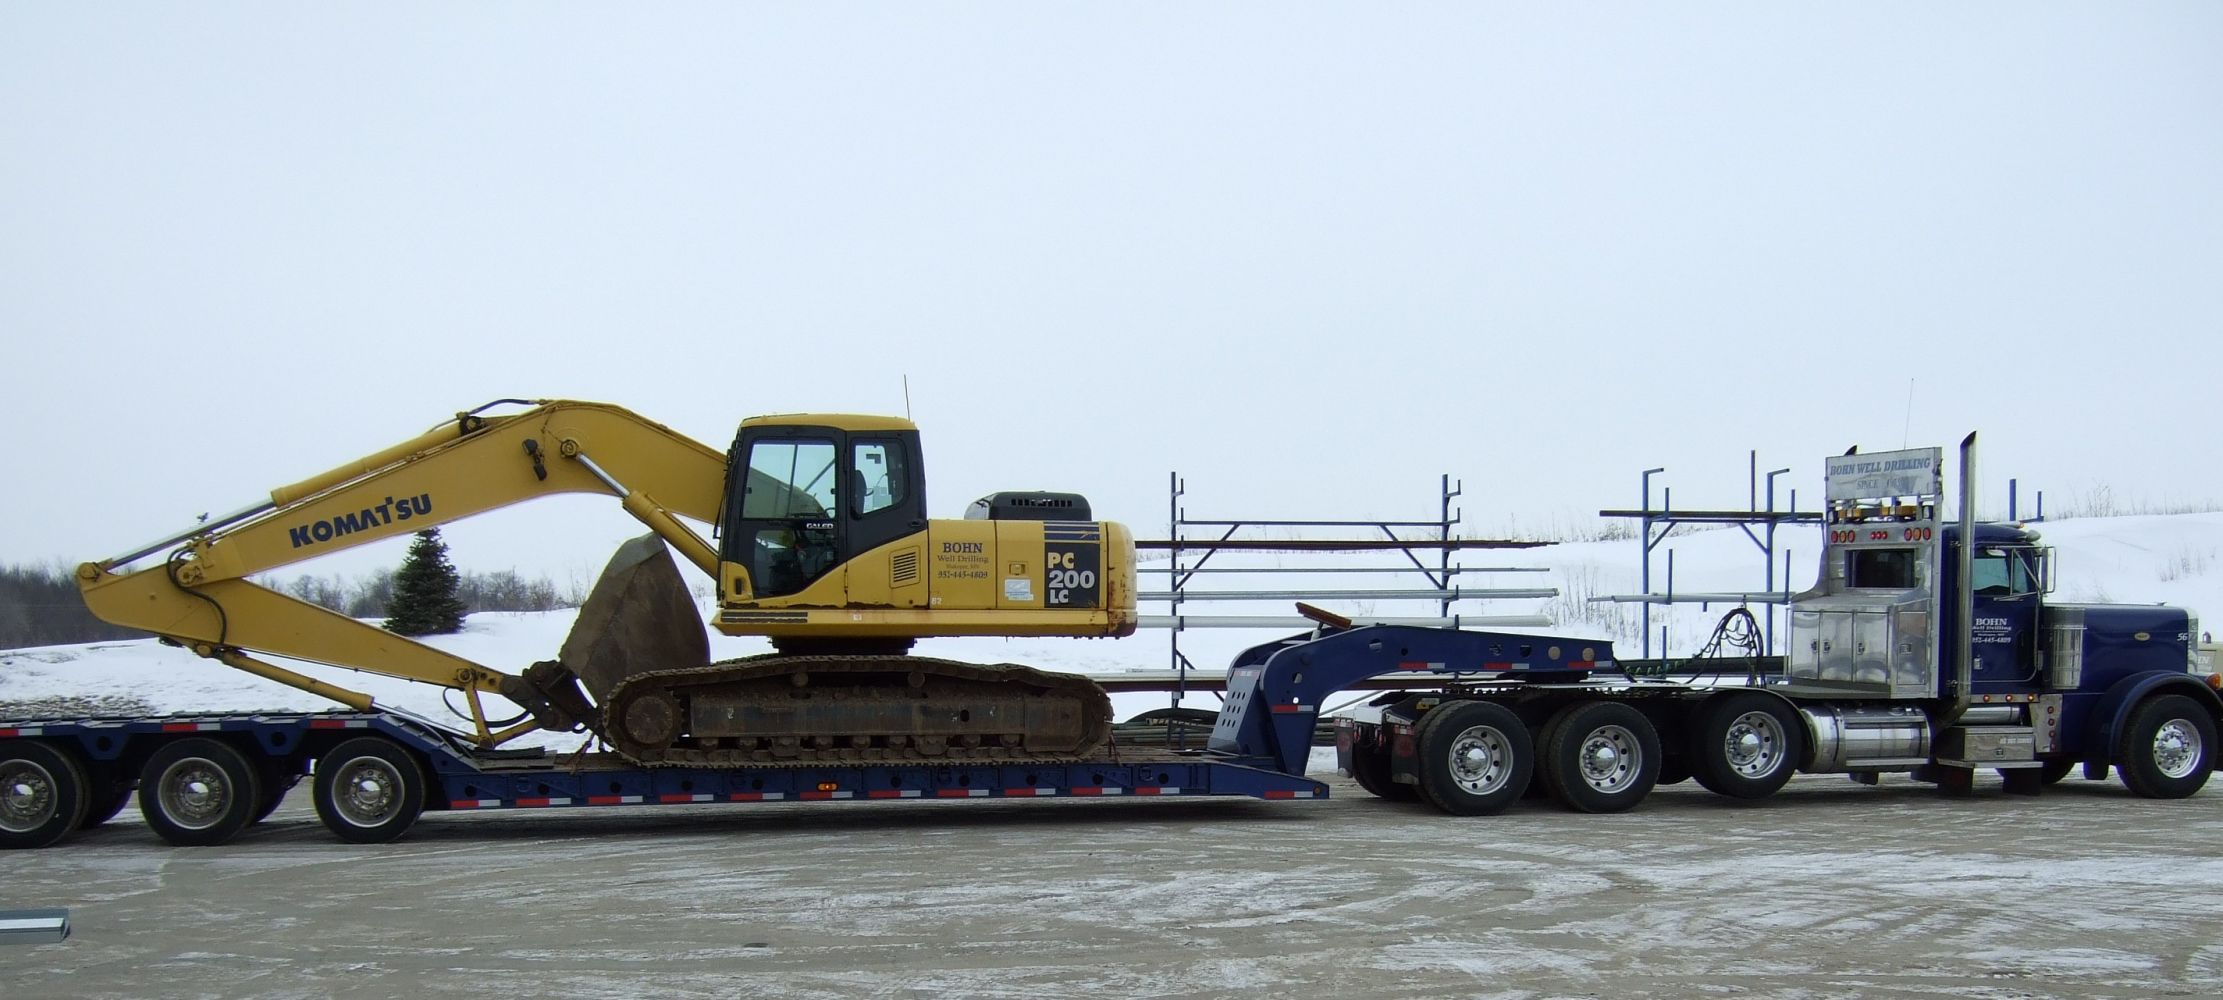 Excavating Equipment & Trucking